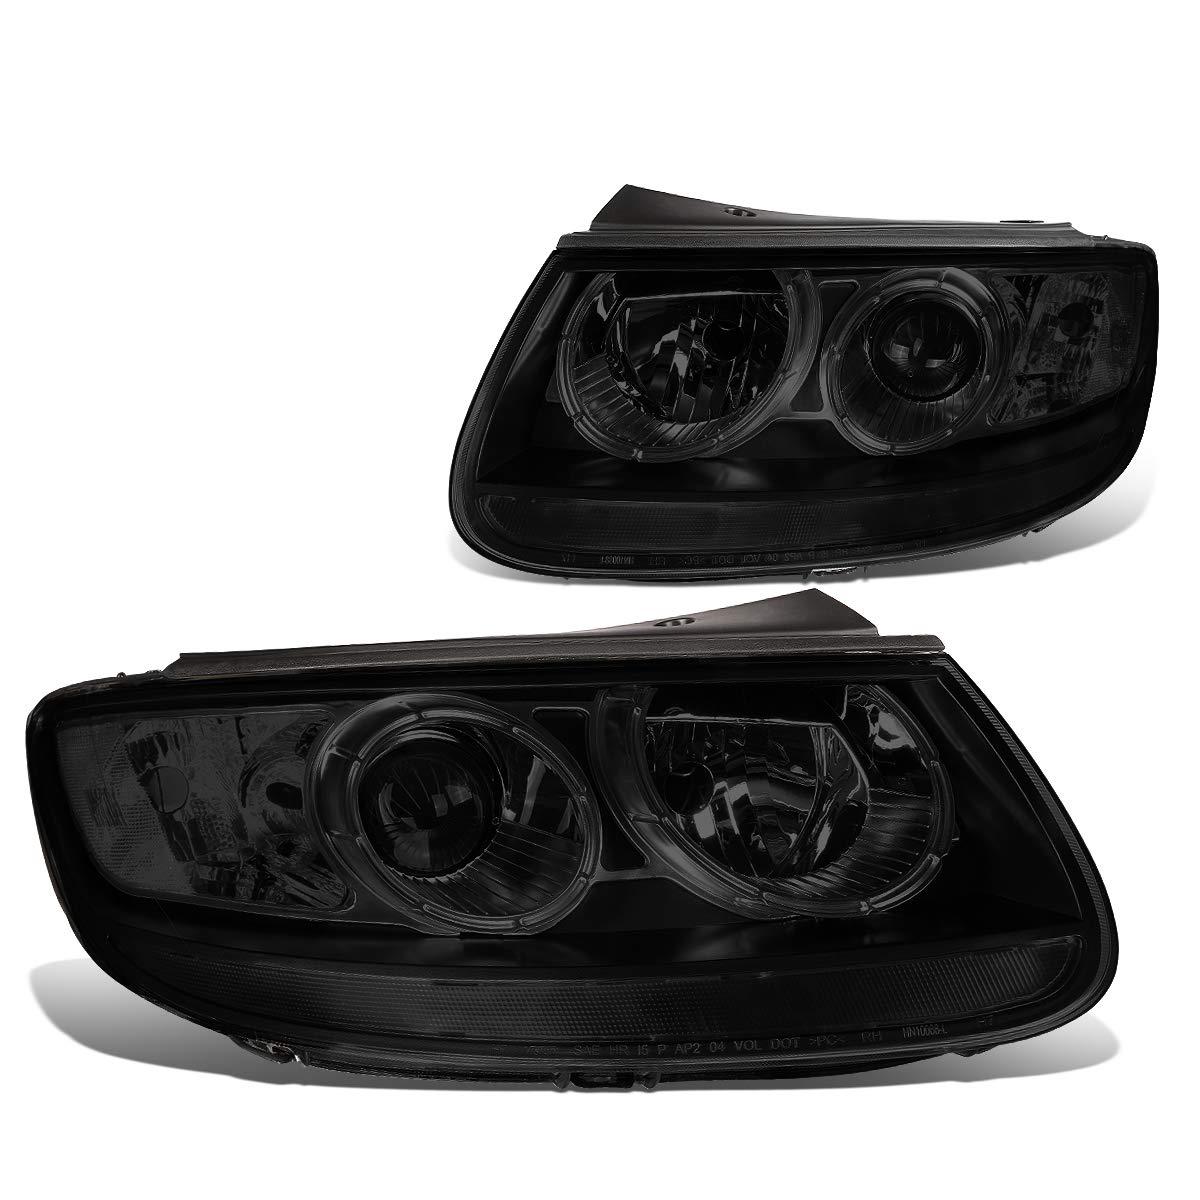 Pair Smoke Housing Clear Corner Projector Headlight/Lamps Replacement for Hyundai Santa Fe 07 08 09 10 11 12